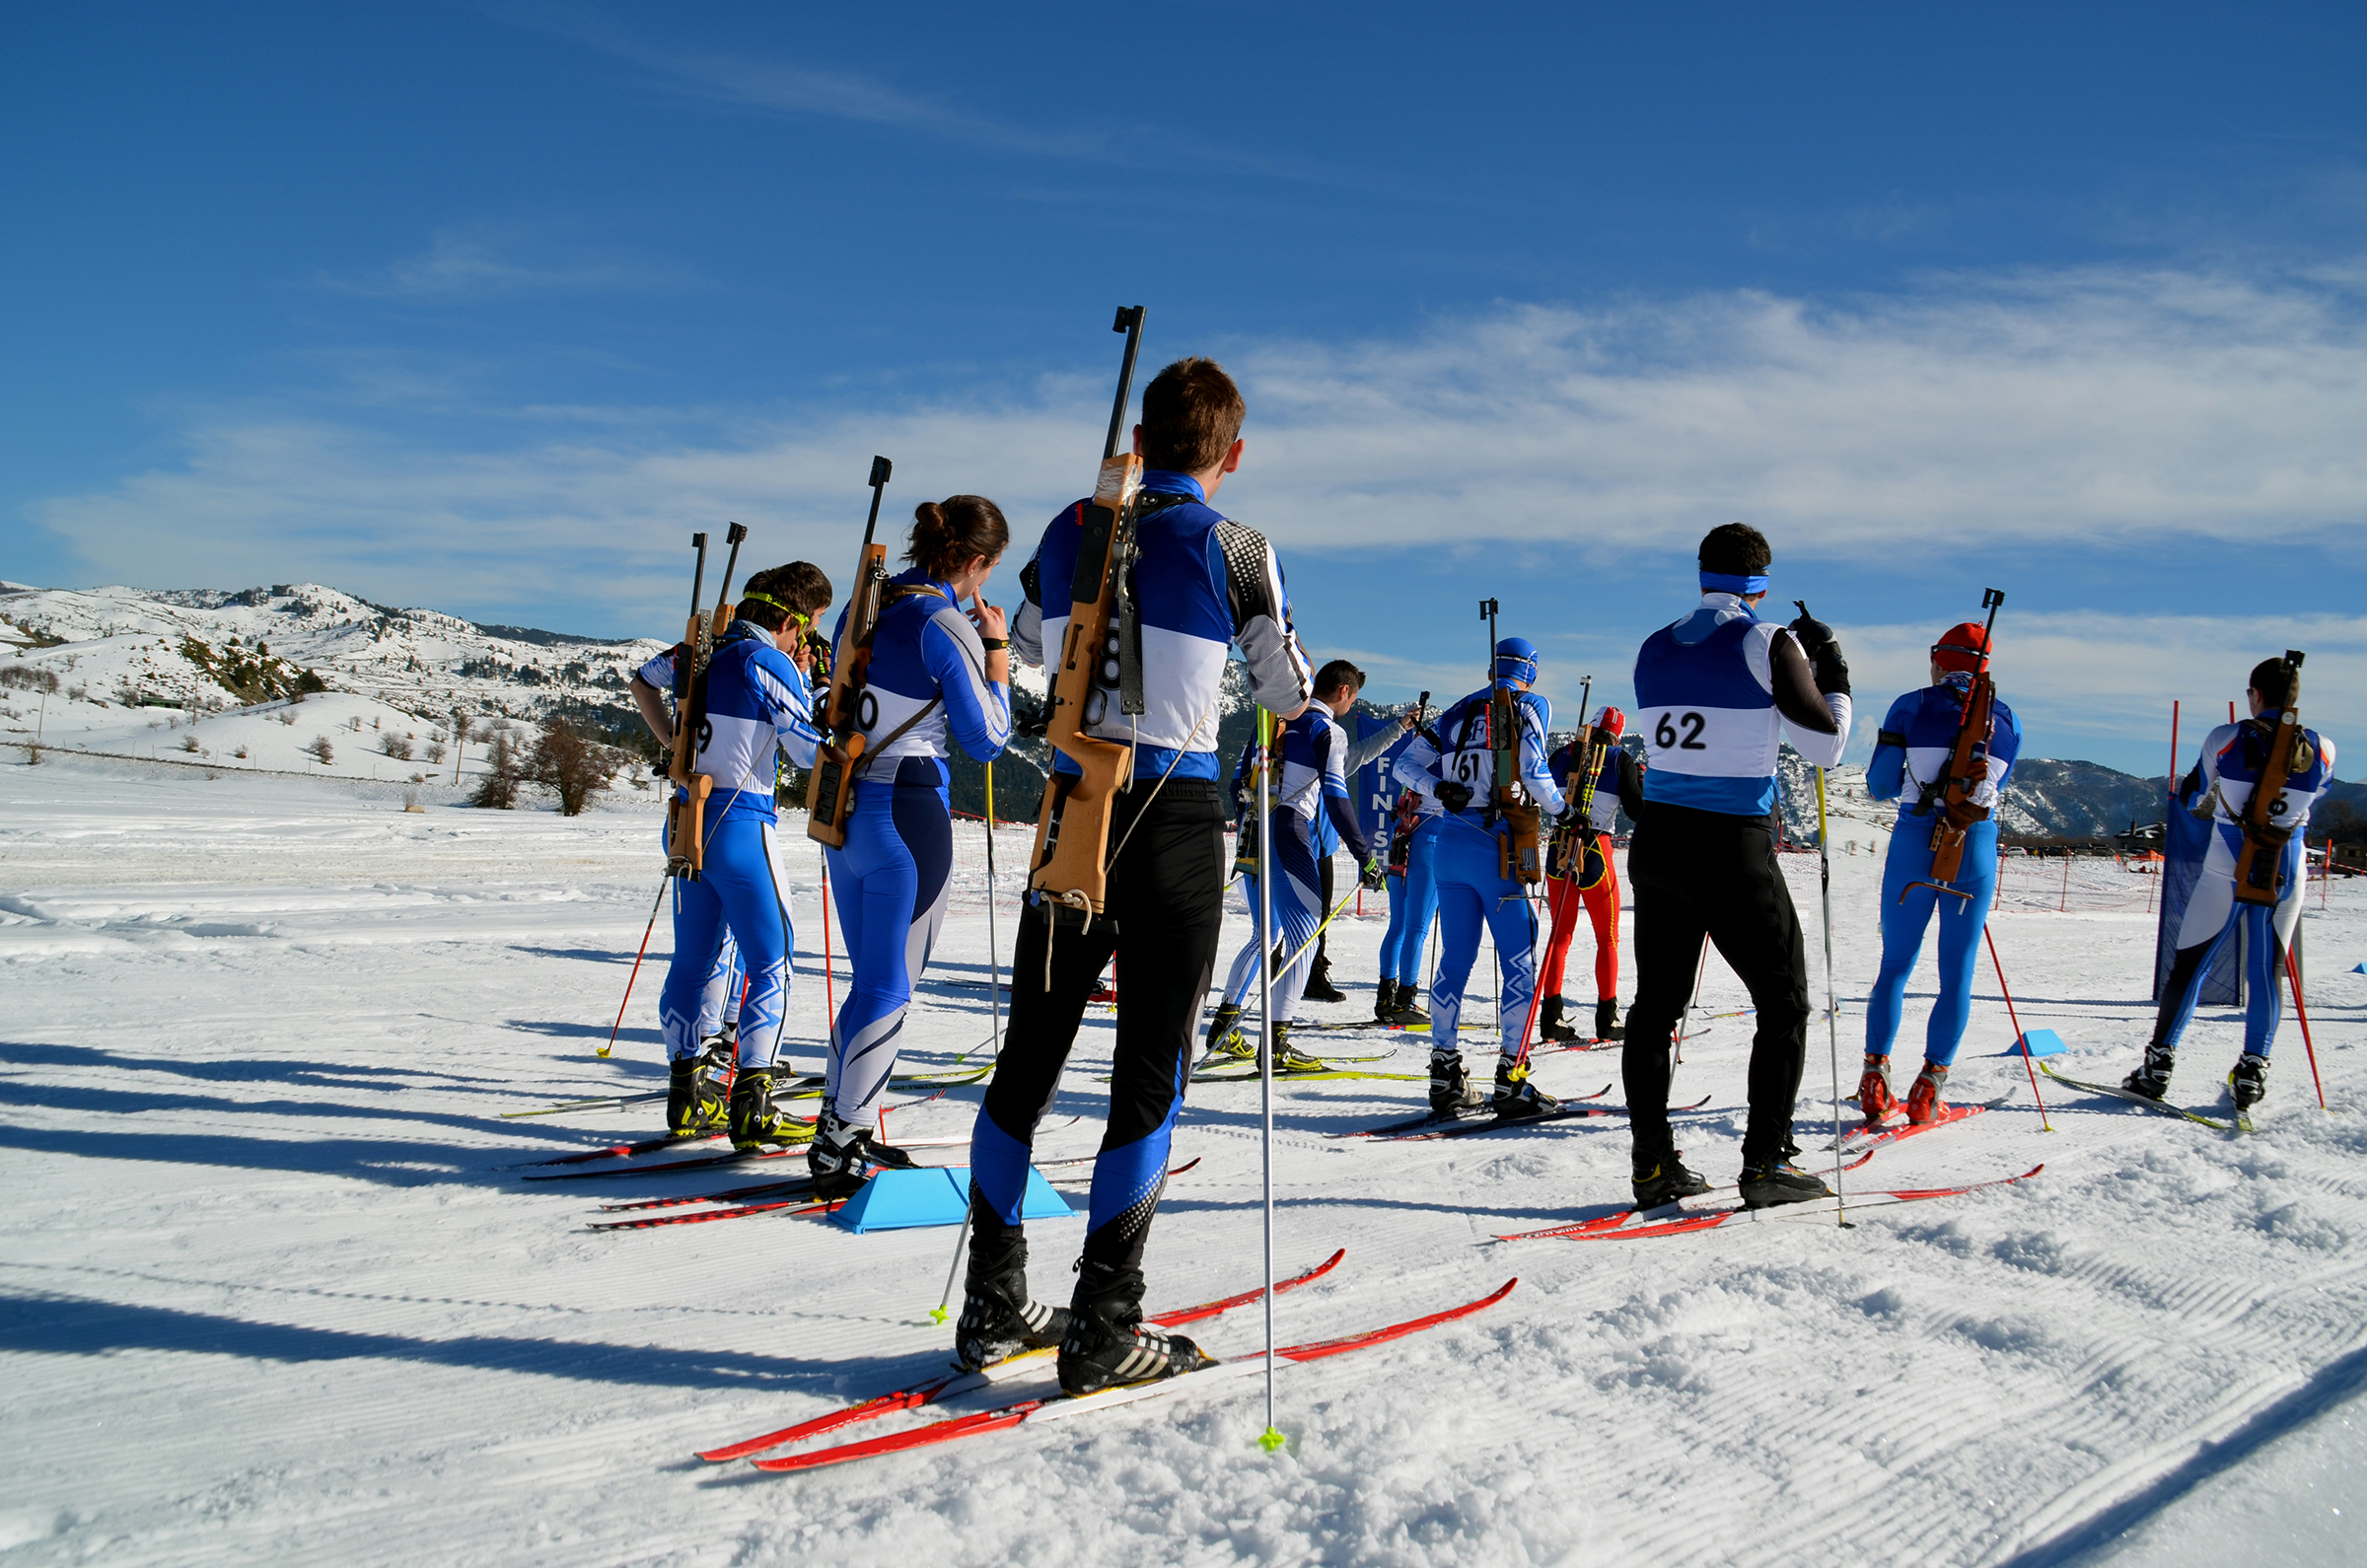 Wintersportzentrum Oberhof